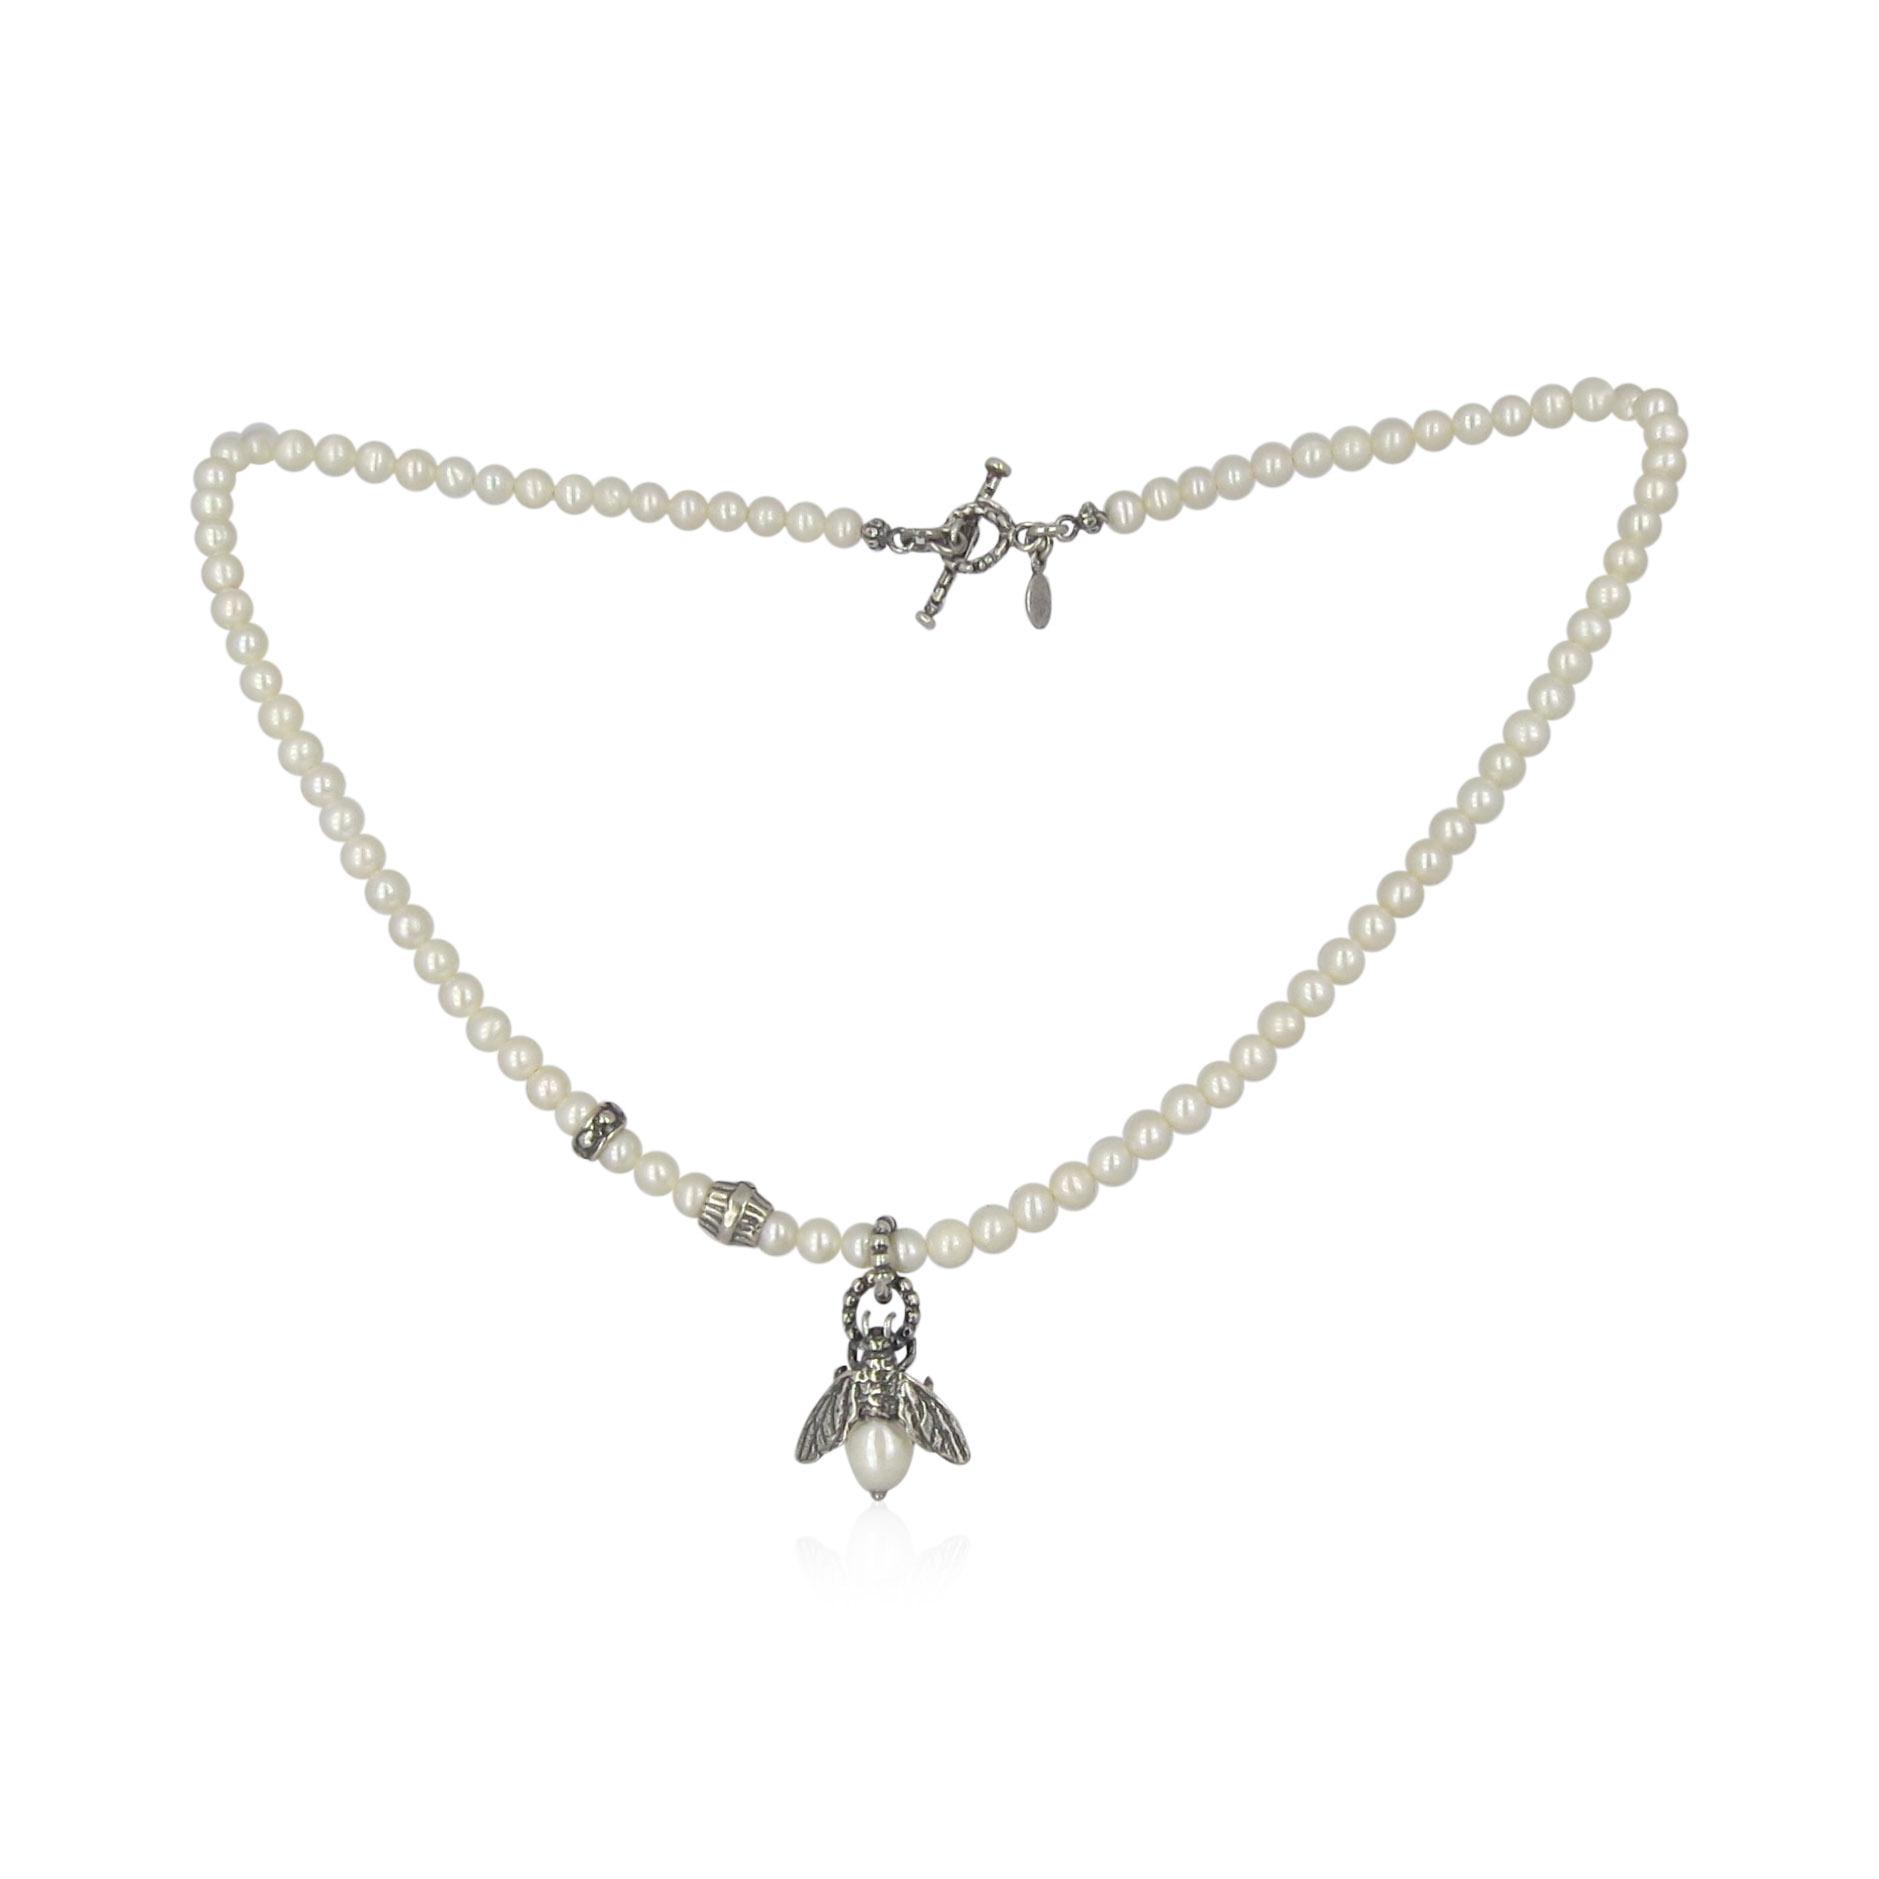 Gem Kingdom Bee Pearls Necklace